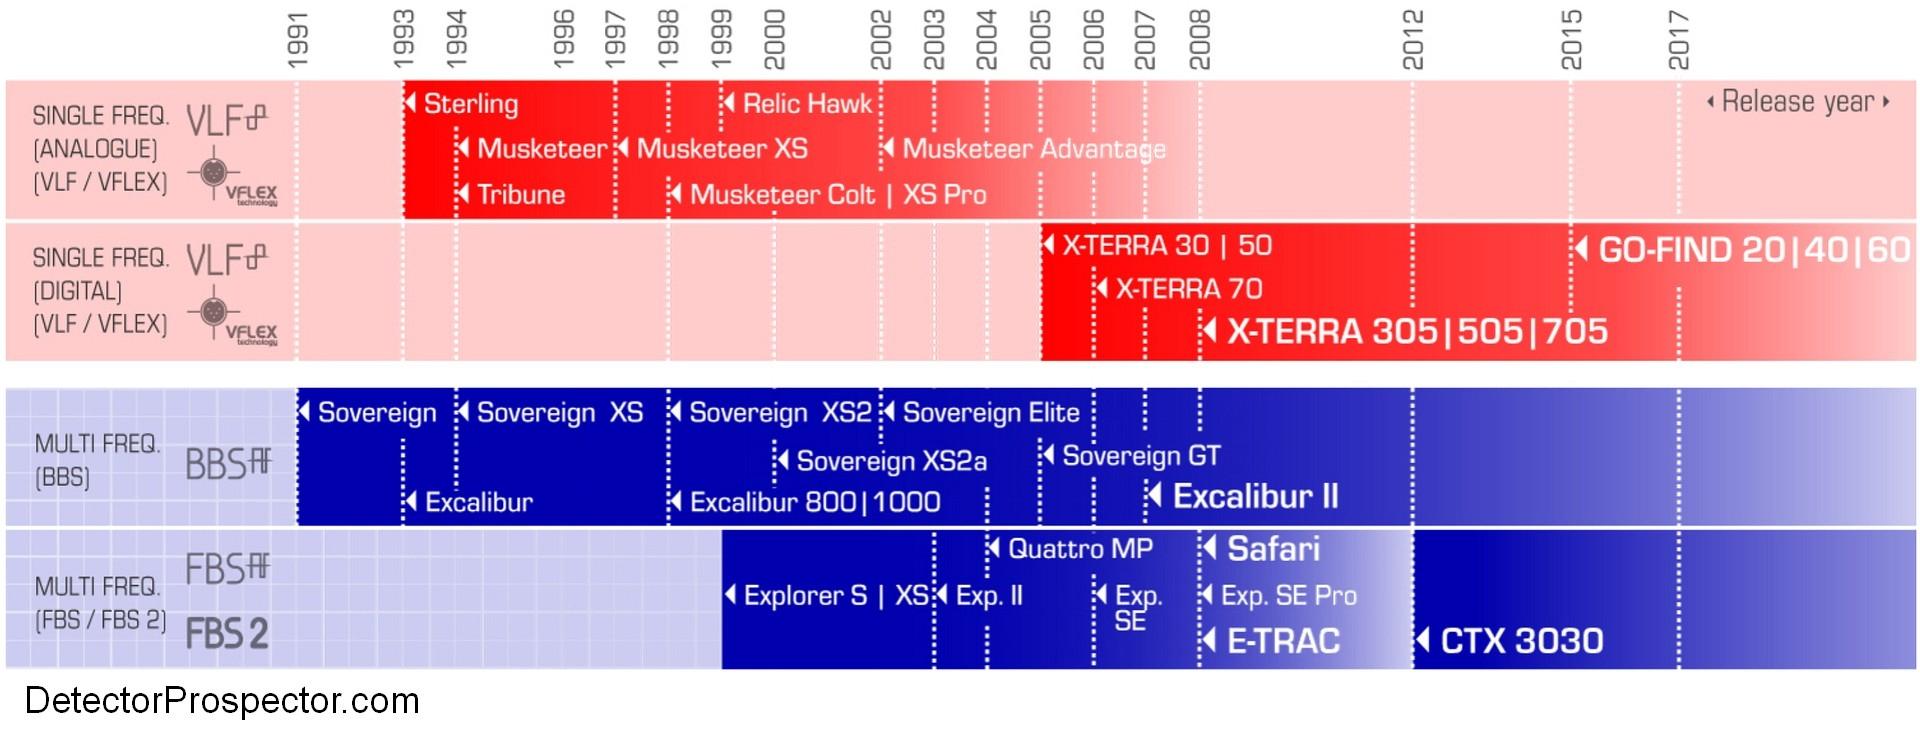 minelab-vlf-bbs-fbs-timeline.jpg.e412b86